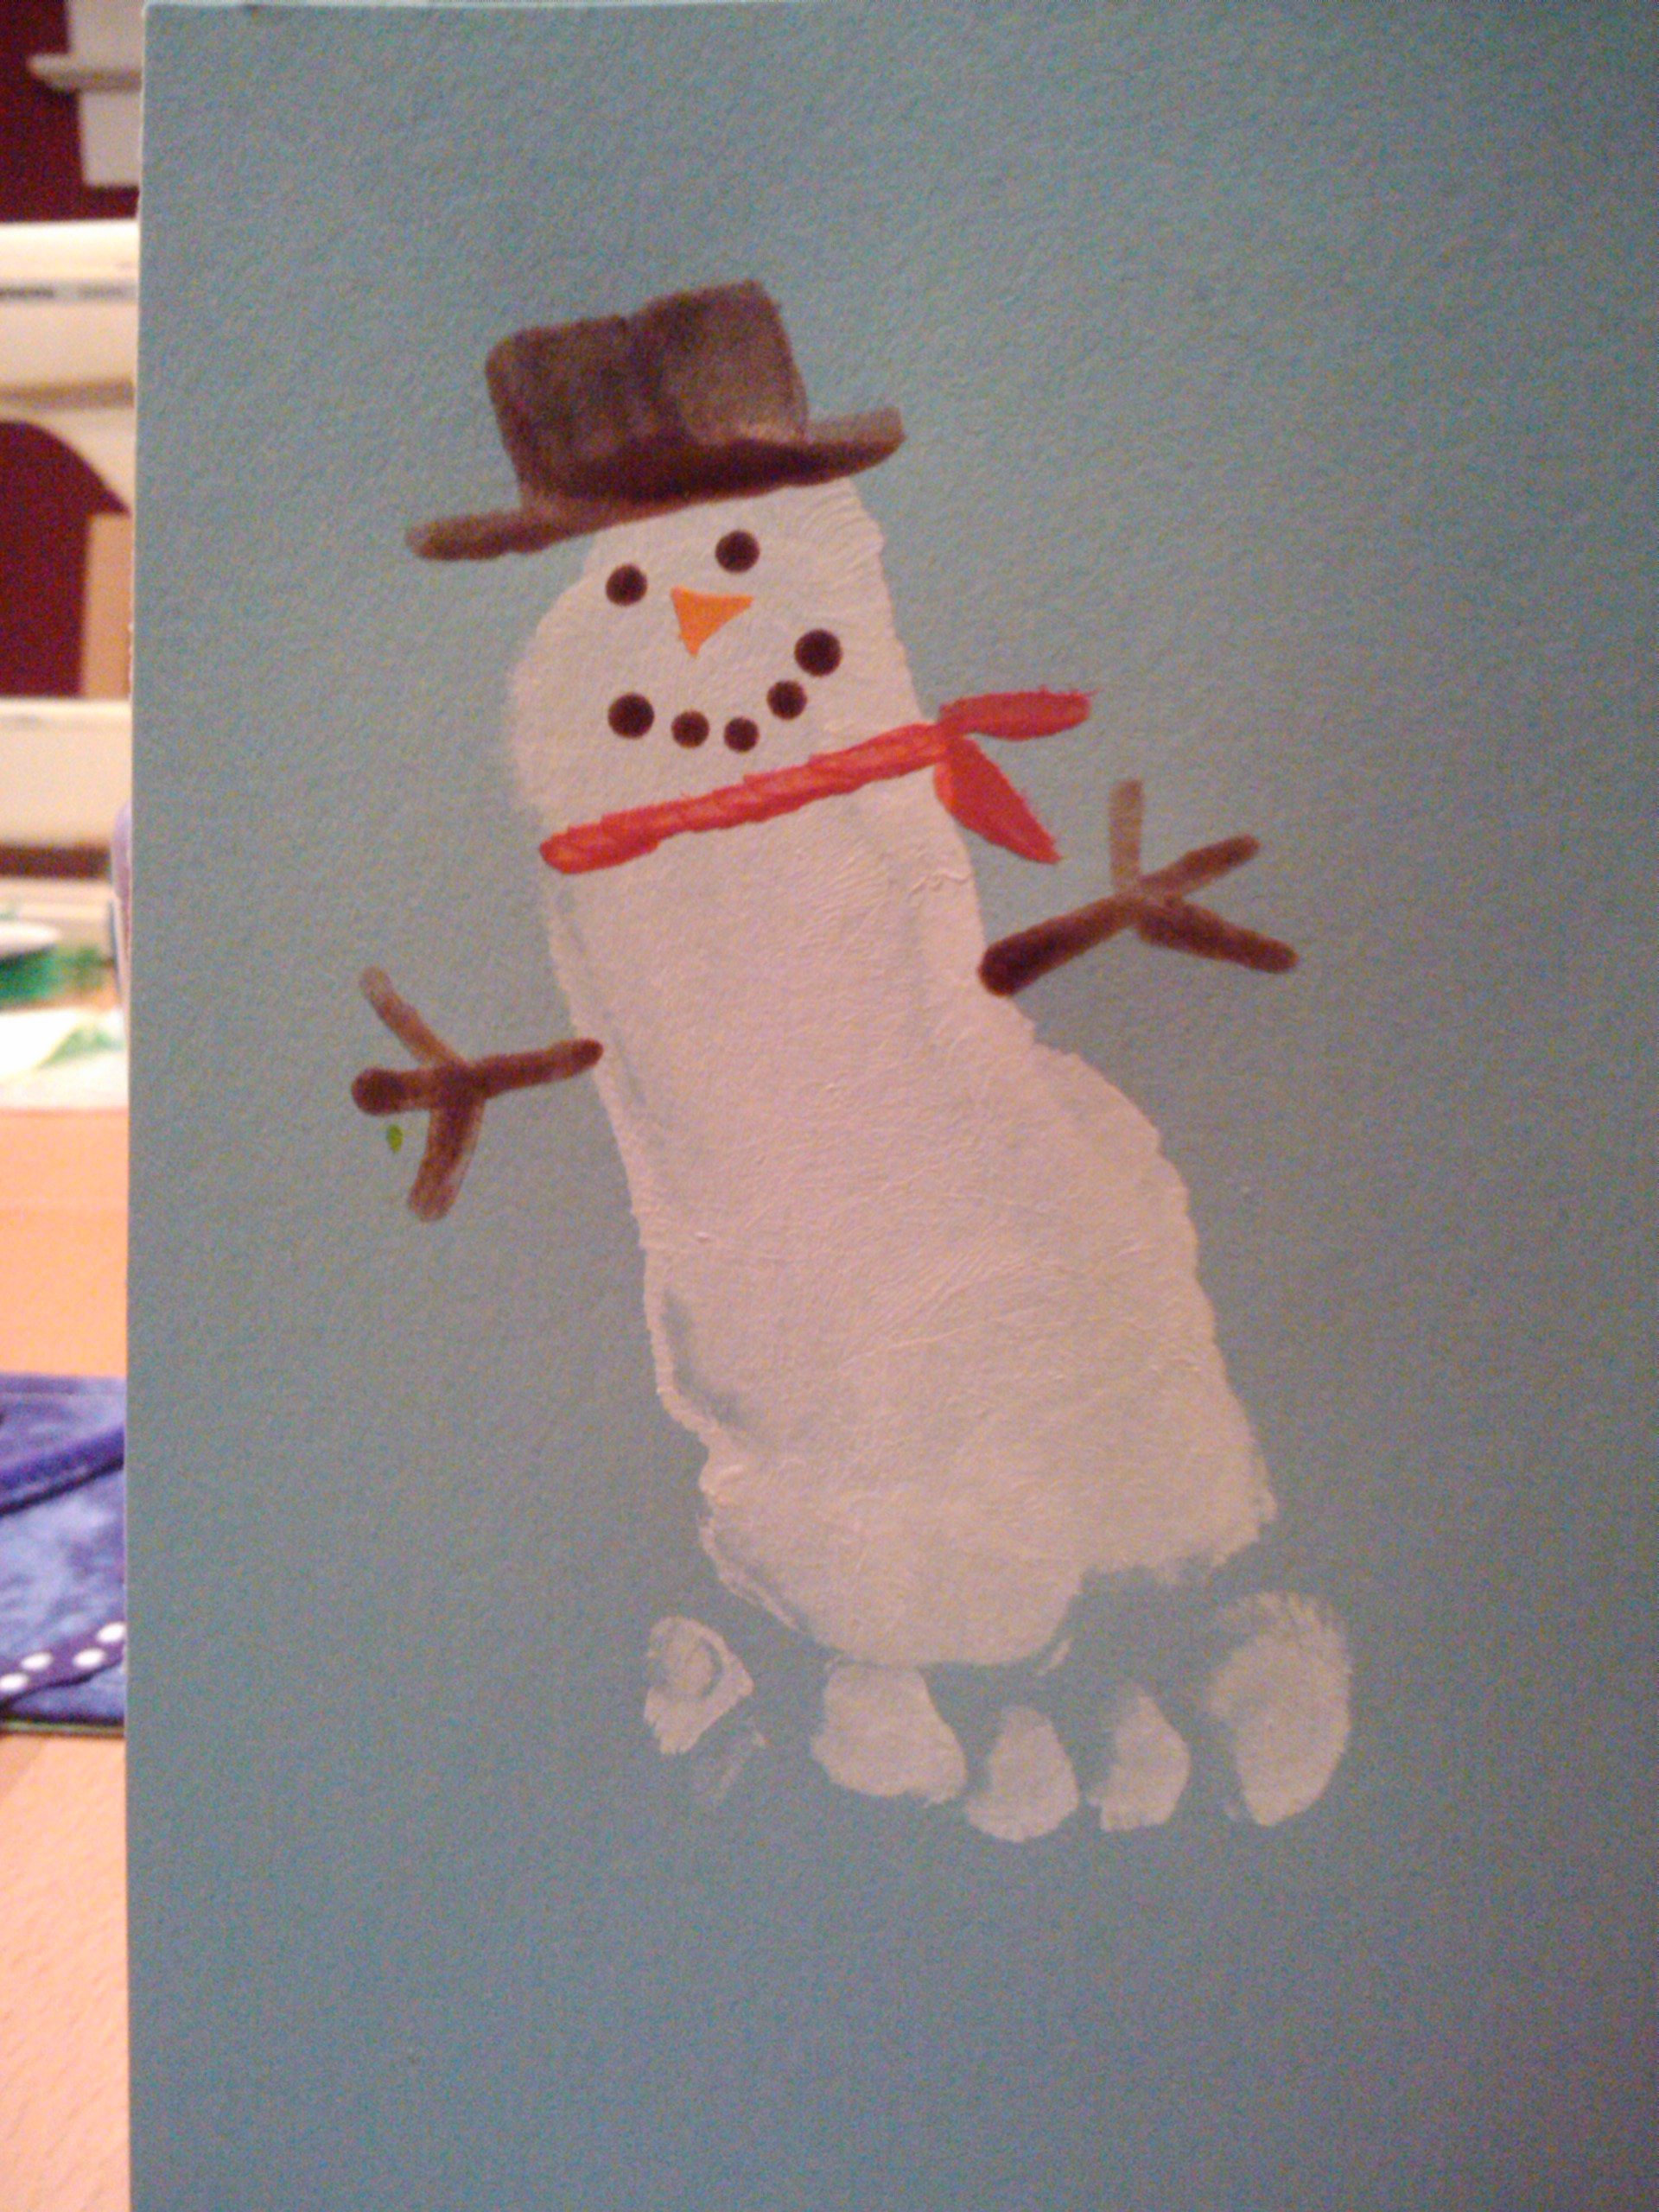 Footprint Snowman Parenting With Crunch